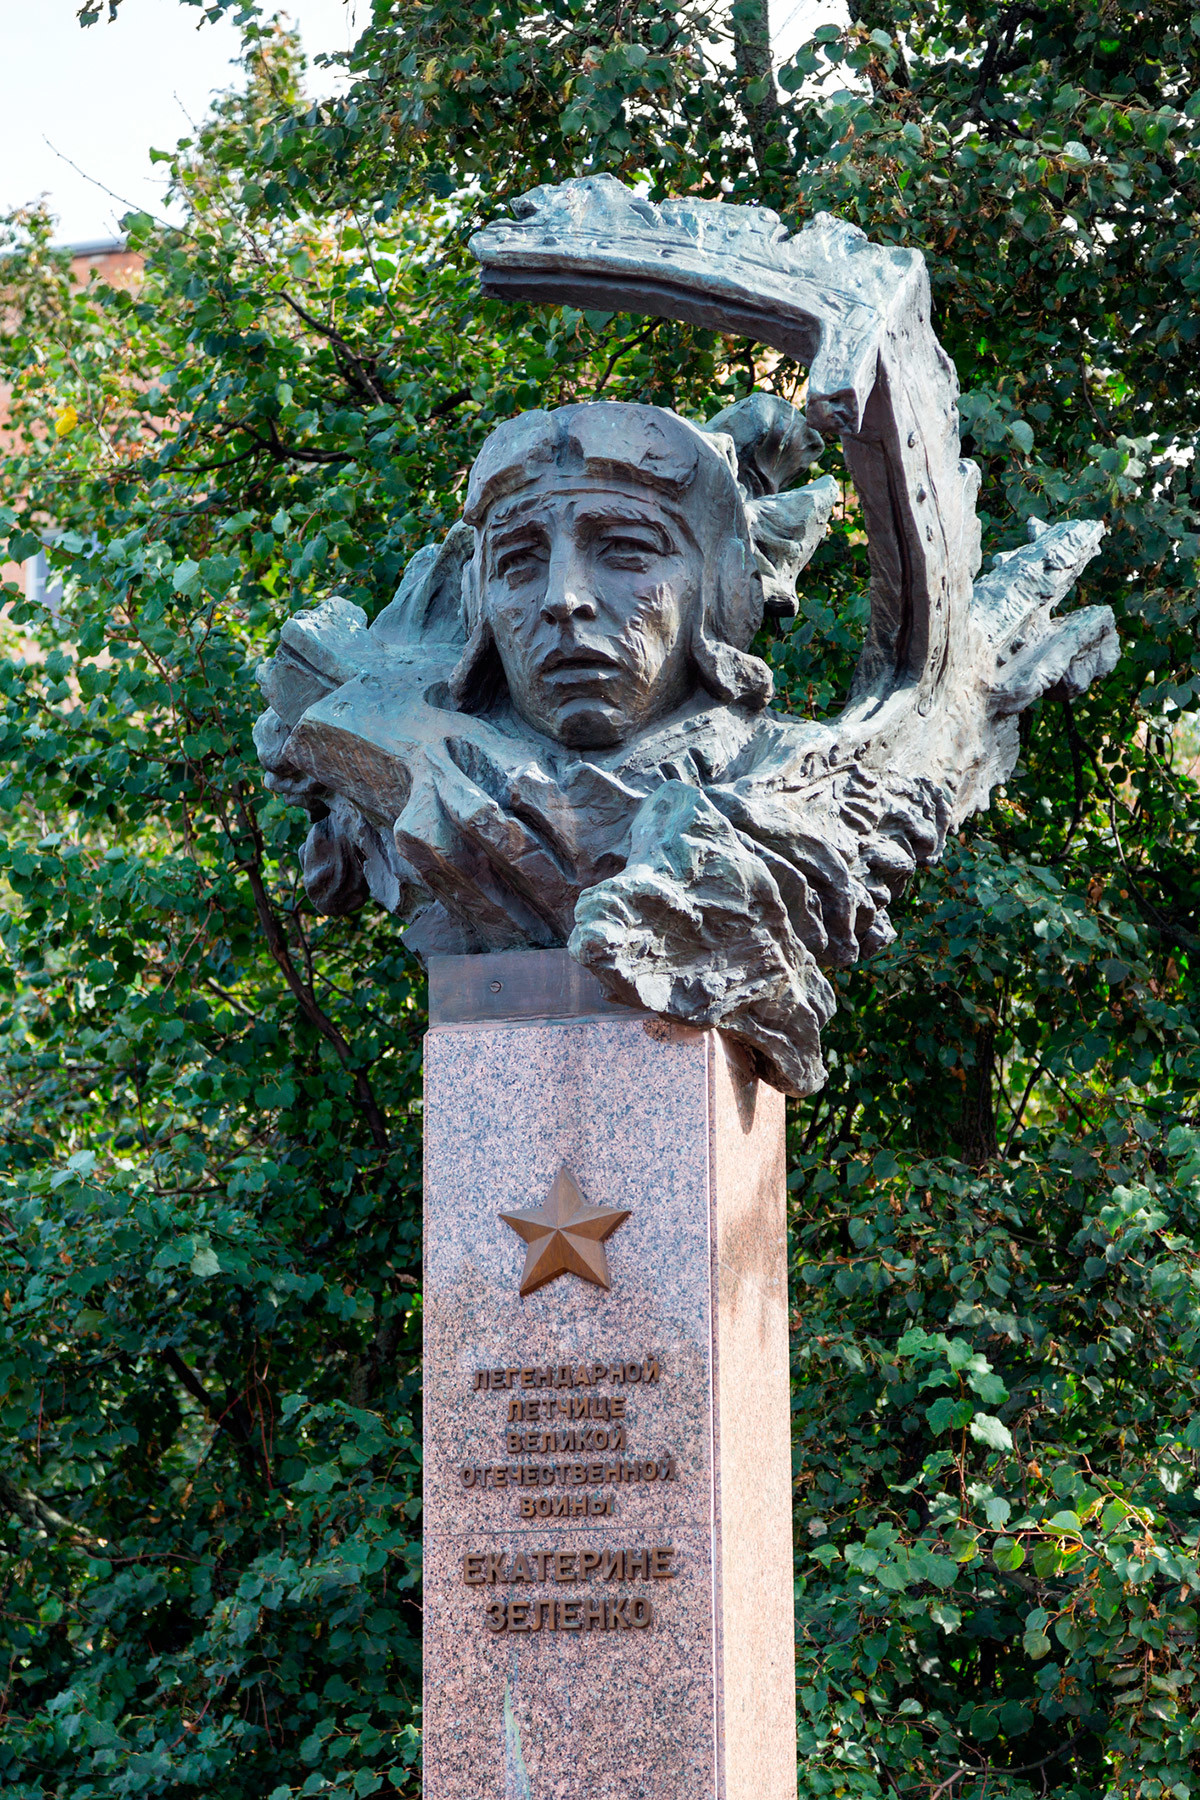 Ein Denkmal für Jekaterina Selenko in Kursk, Russland